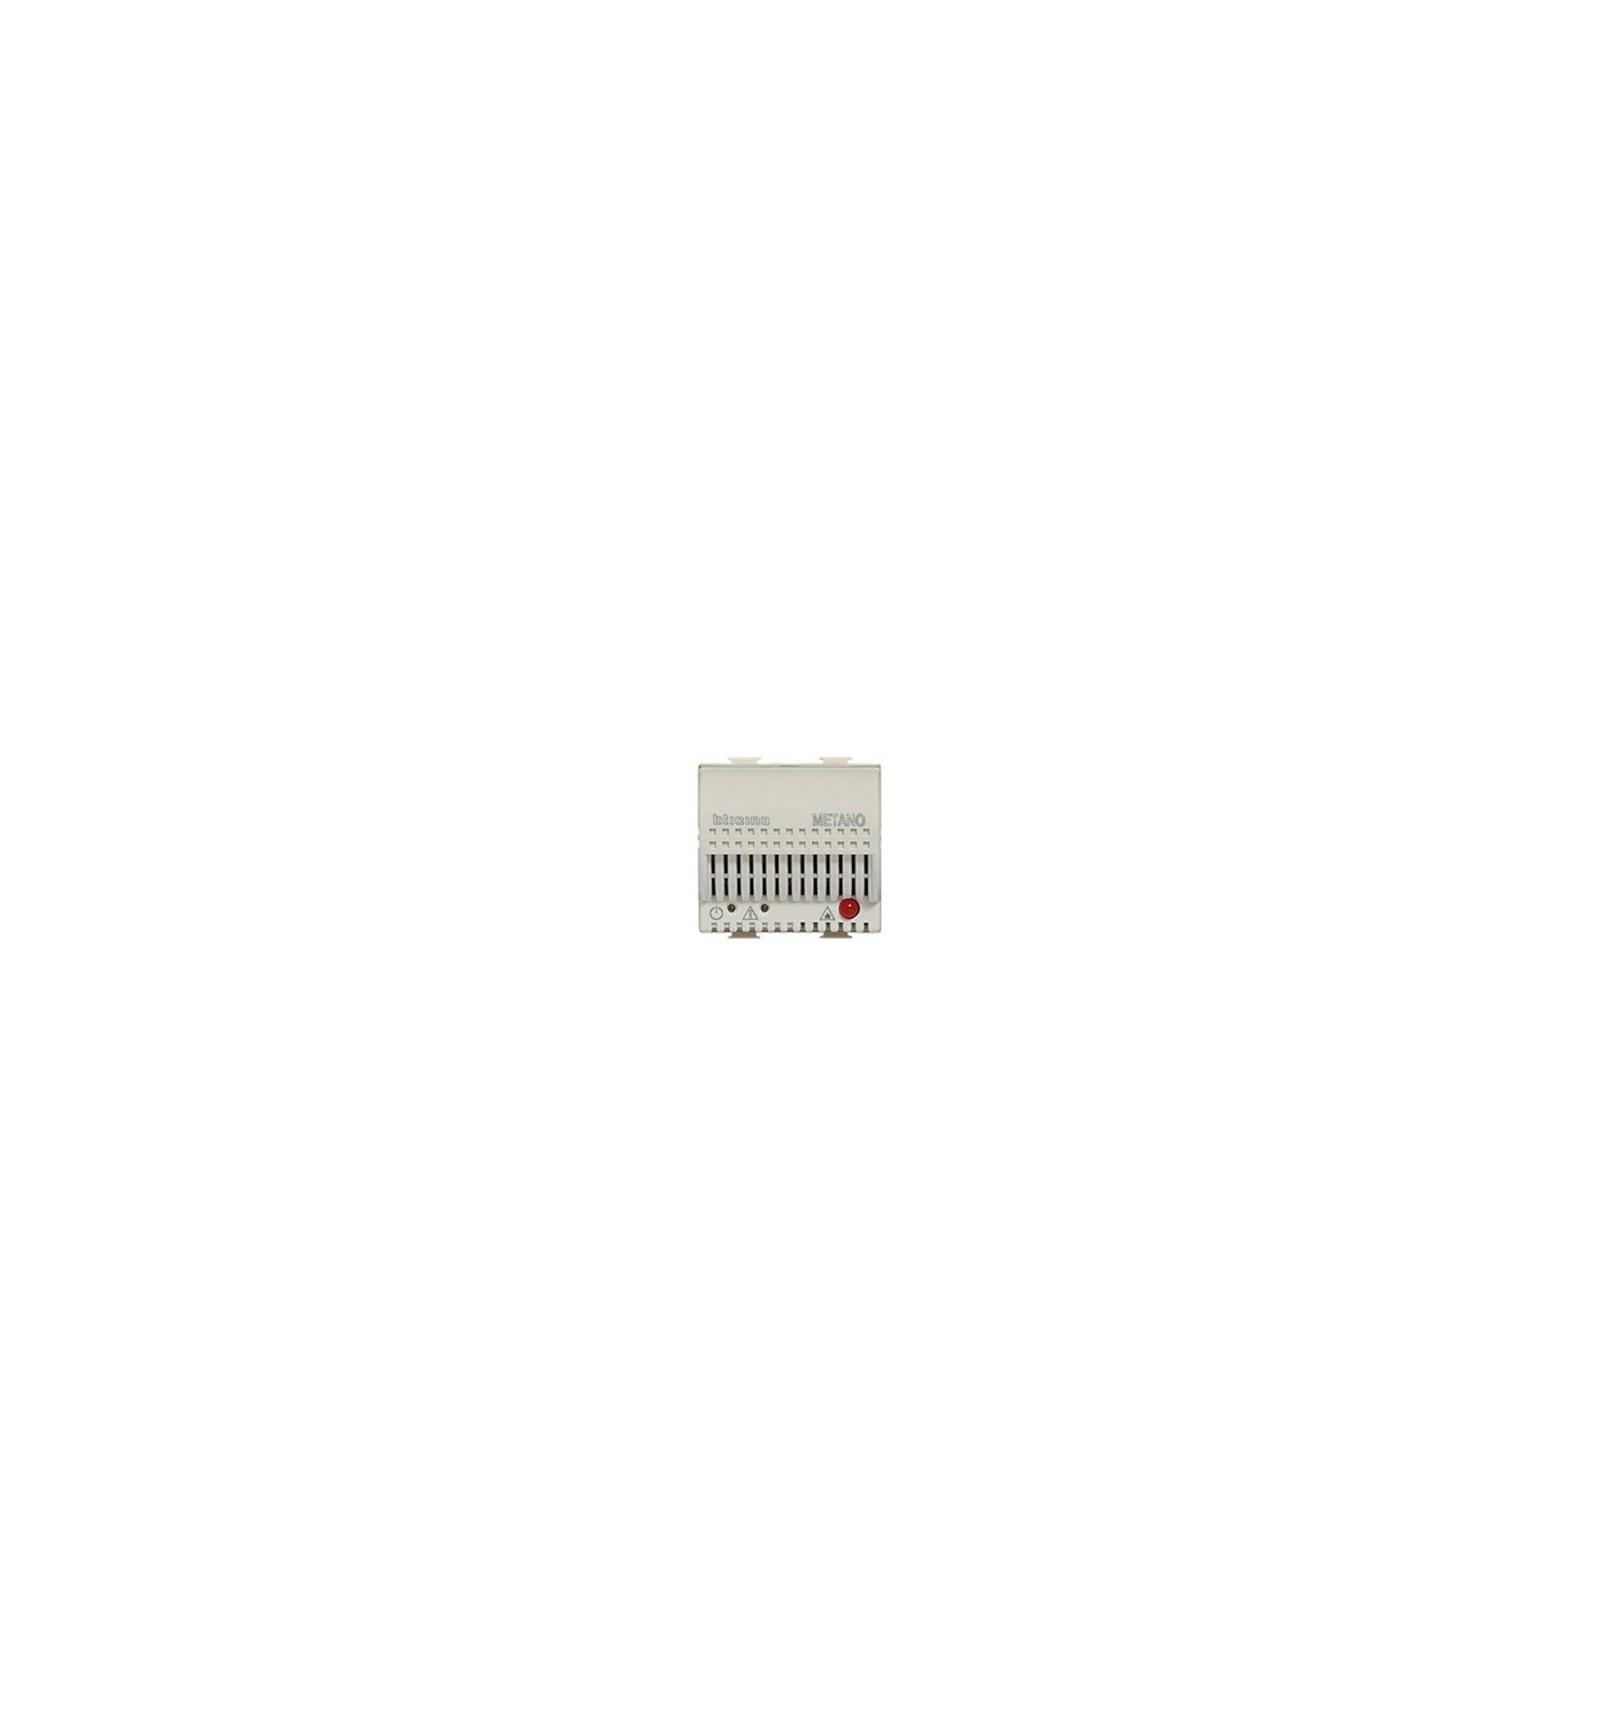 BTICINO MAGIC TT - RIVELATORE GAS METANO COD. A5731/12 - BTICINO LEGRAND A5731/12